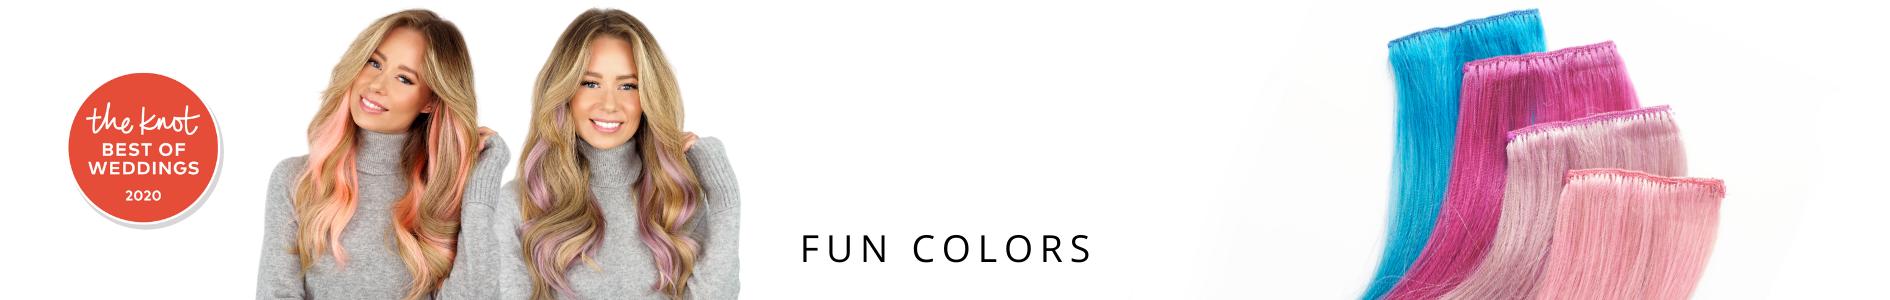 5-fun-colors-store-banner.png